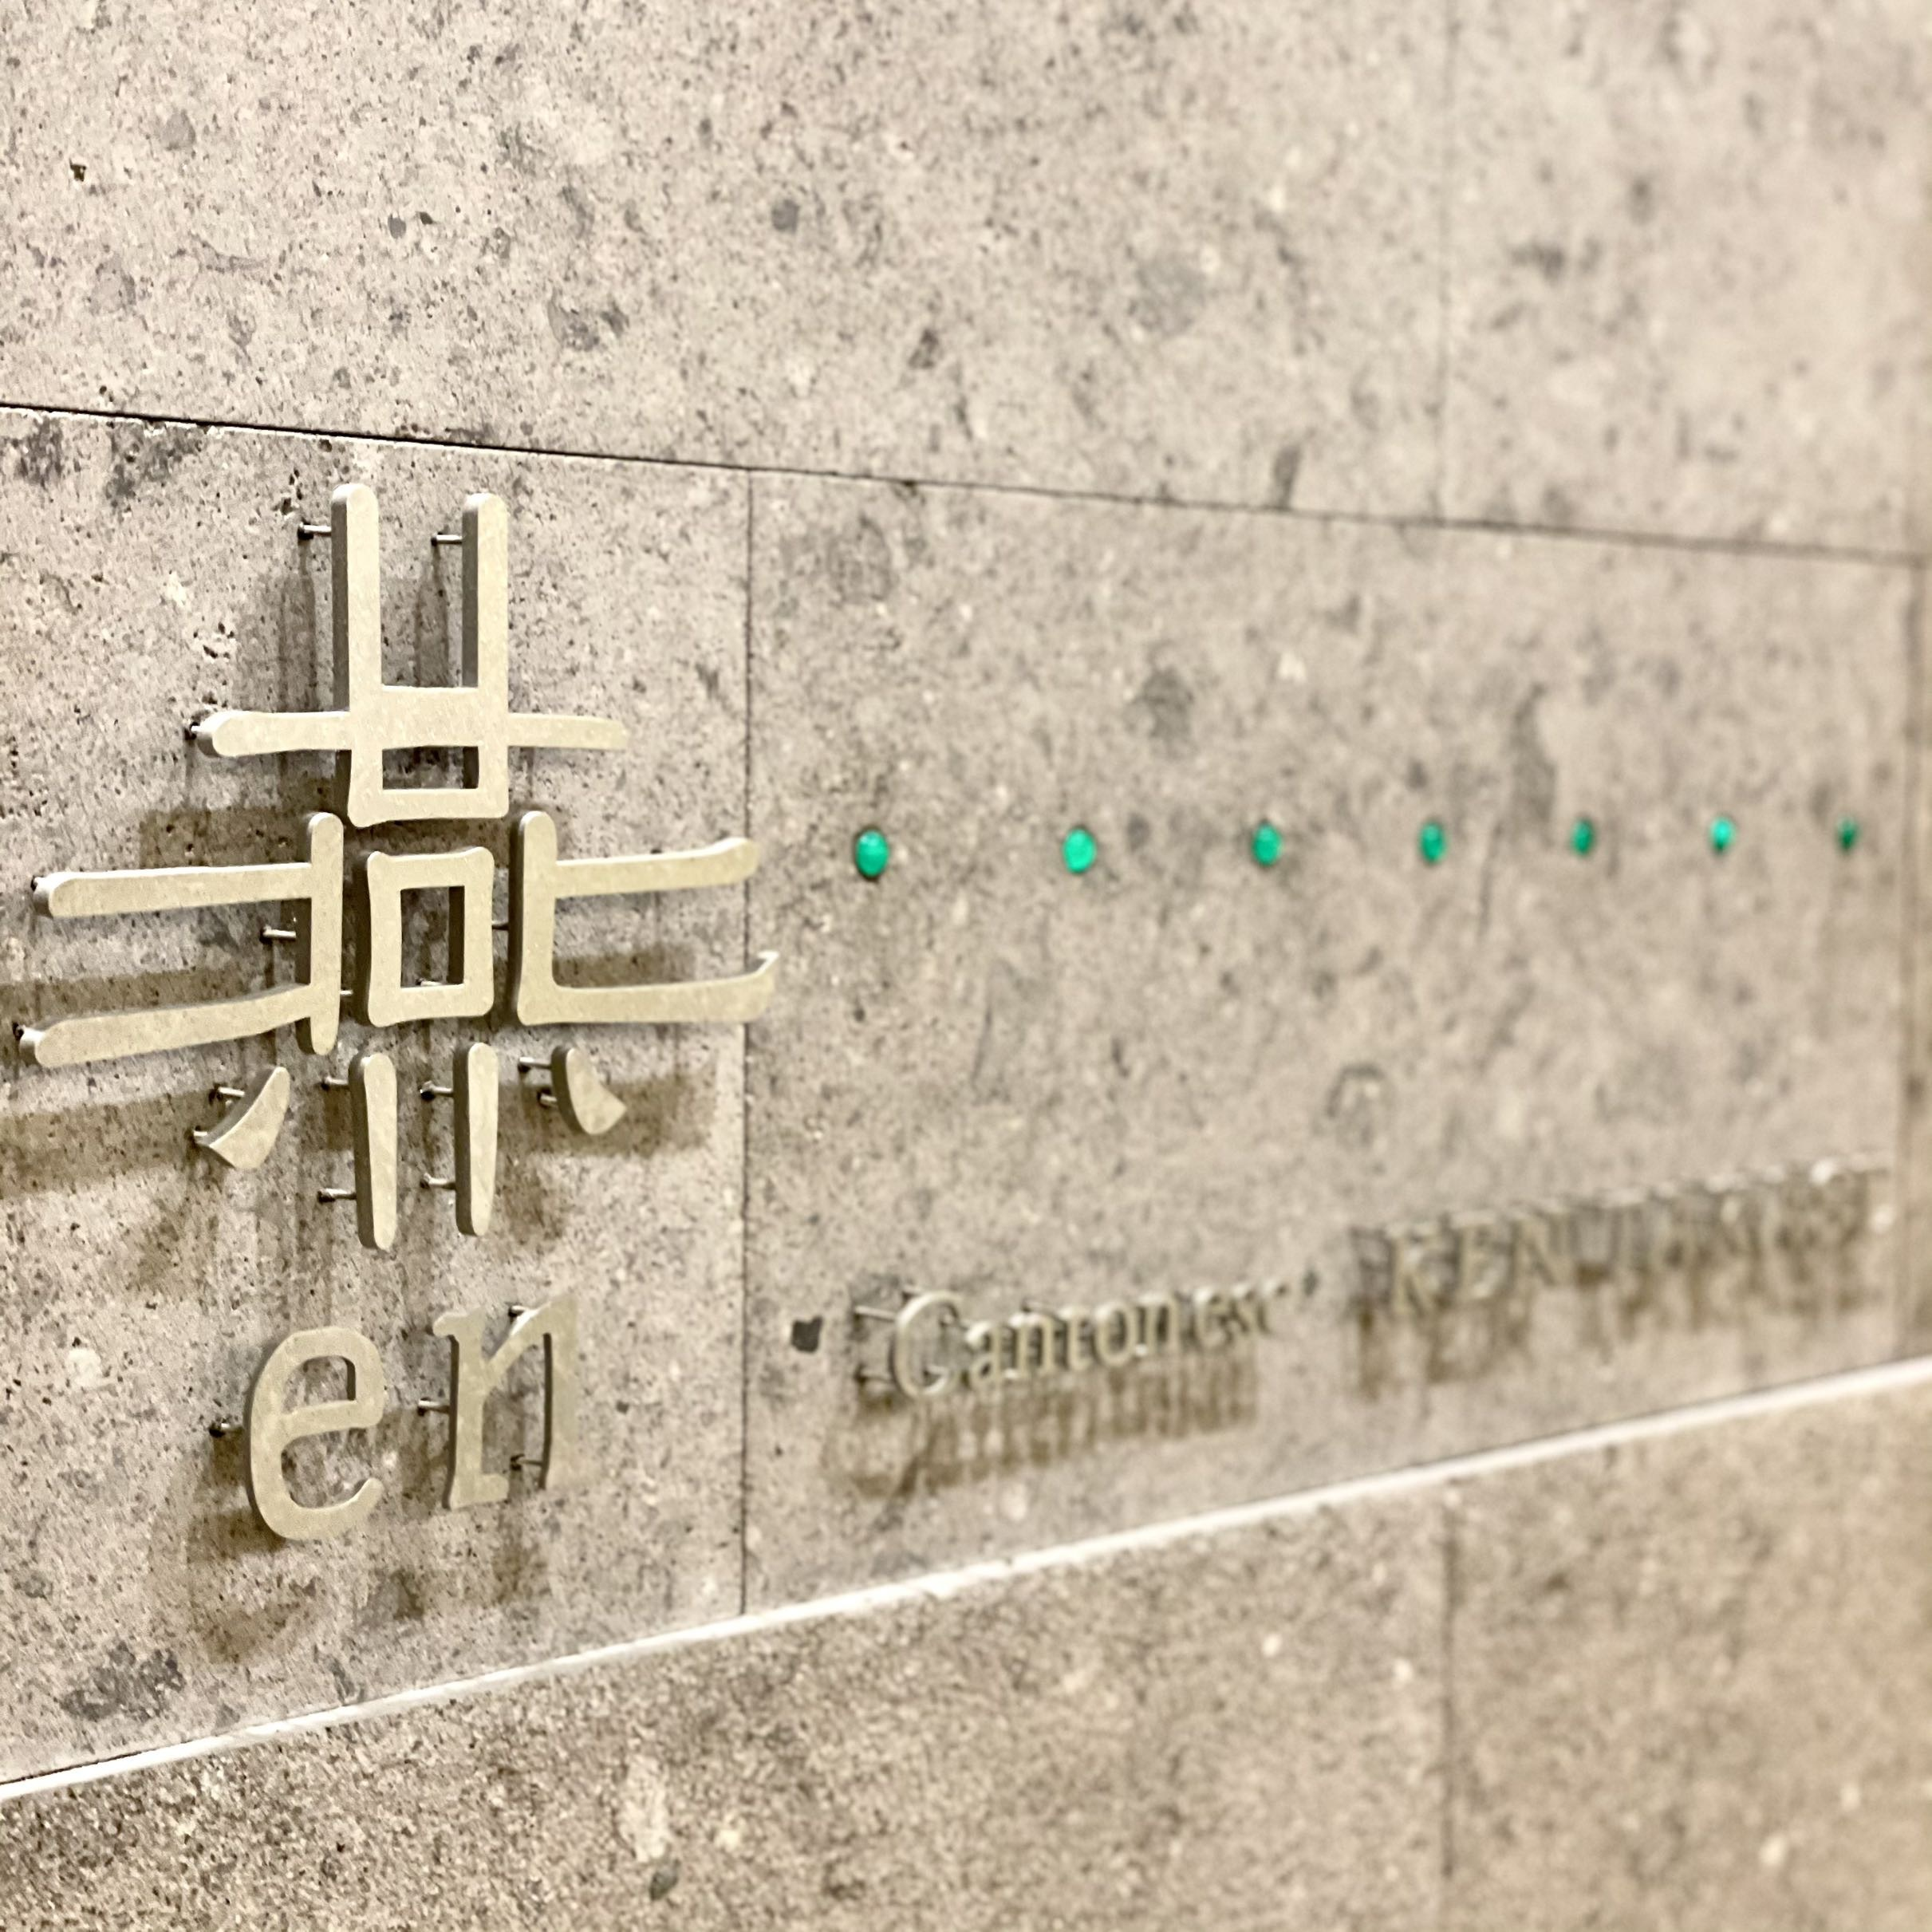 「Cantonese 燕 KEN TAKASE」お店の入り口